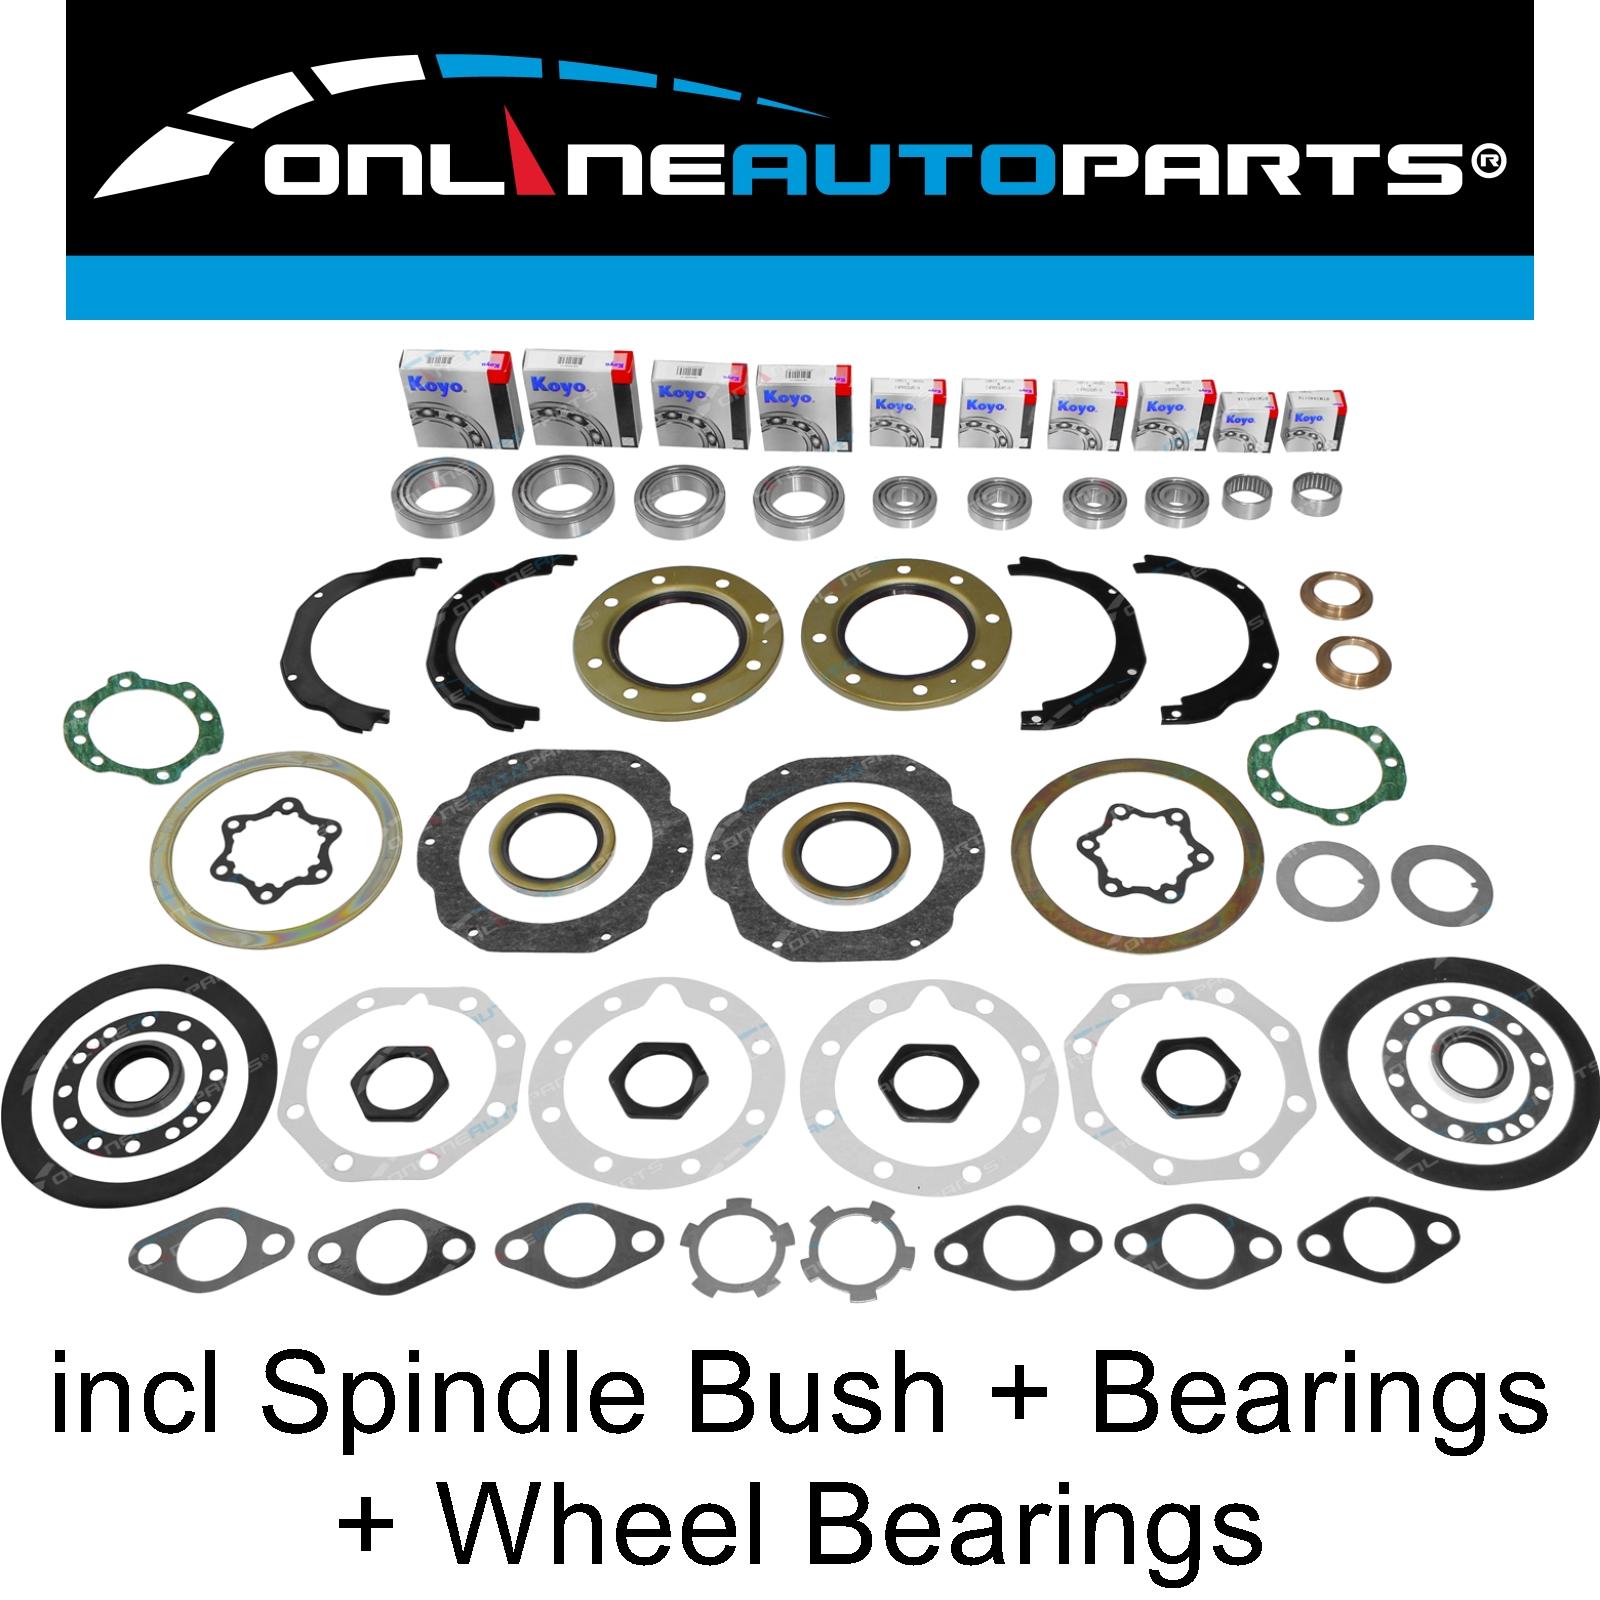 axle parts automotive wheel bearing seal kit suit toyota landcruiser fzj78  troopy front swivel hub  recamier